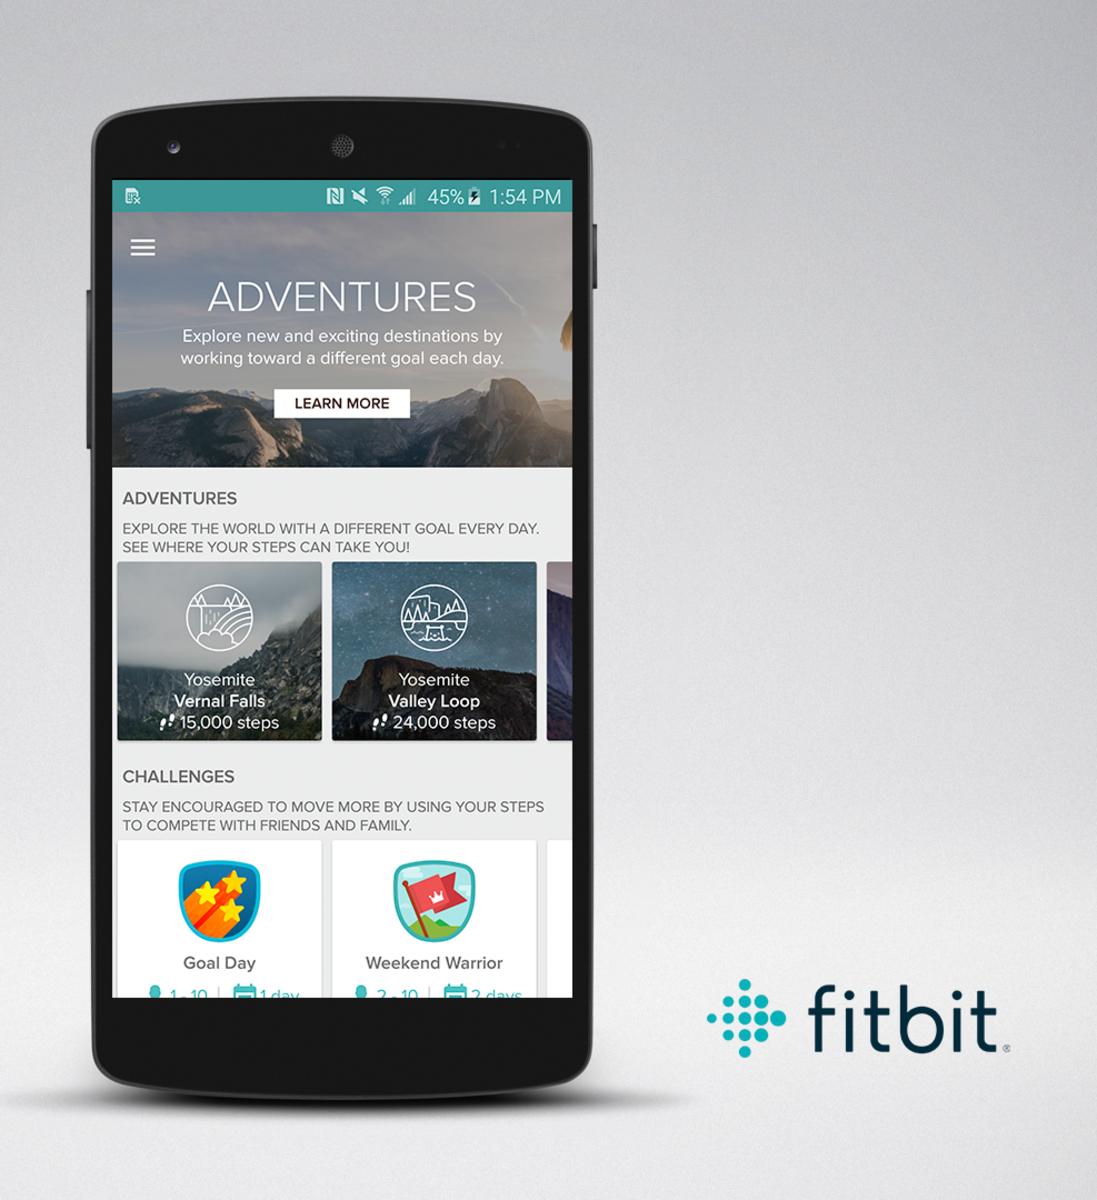 fitbit-adventures.png